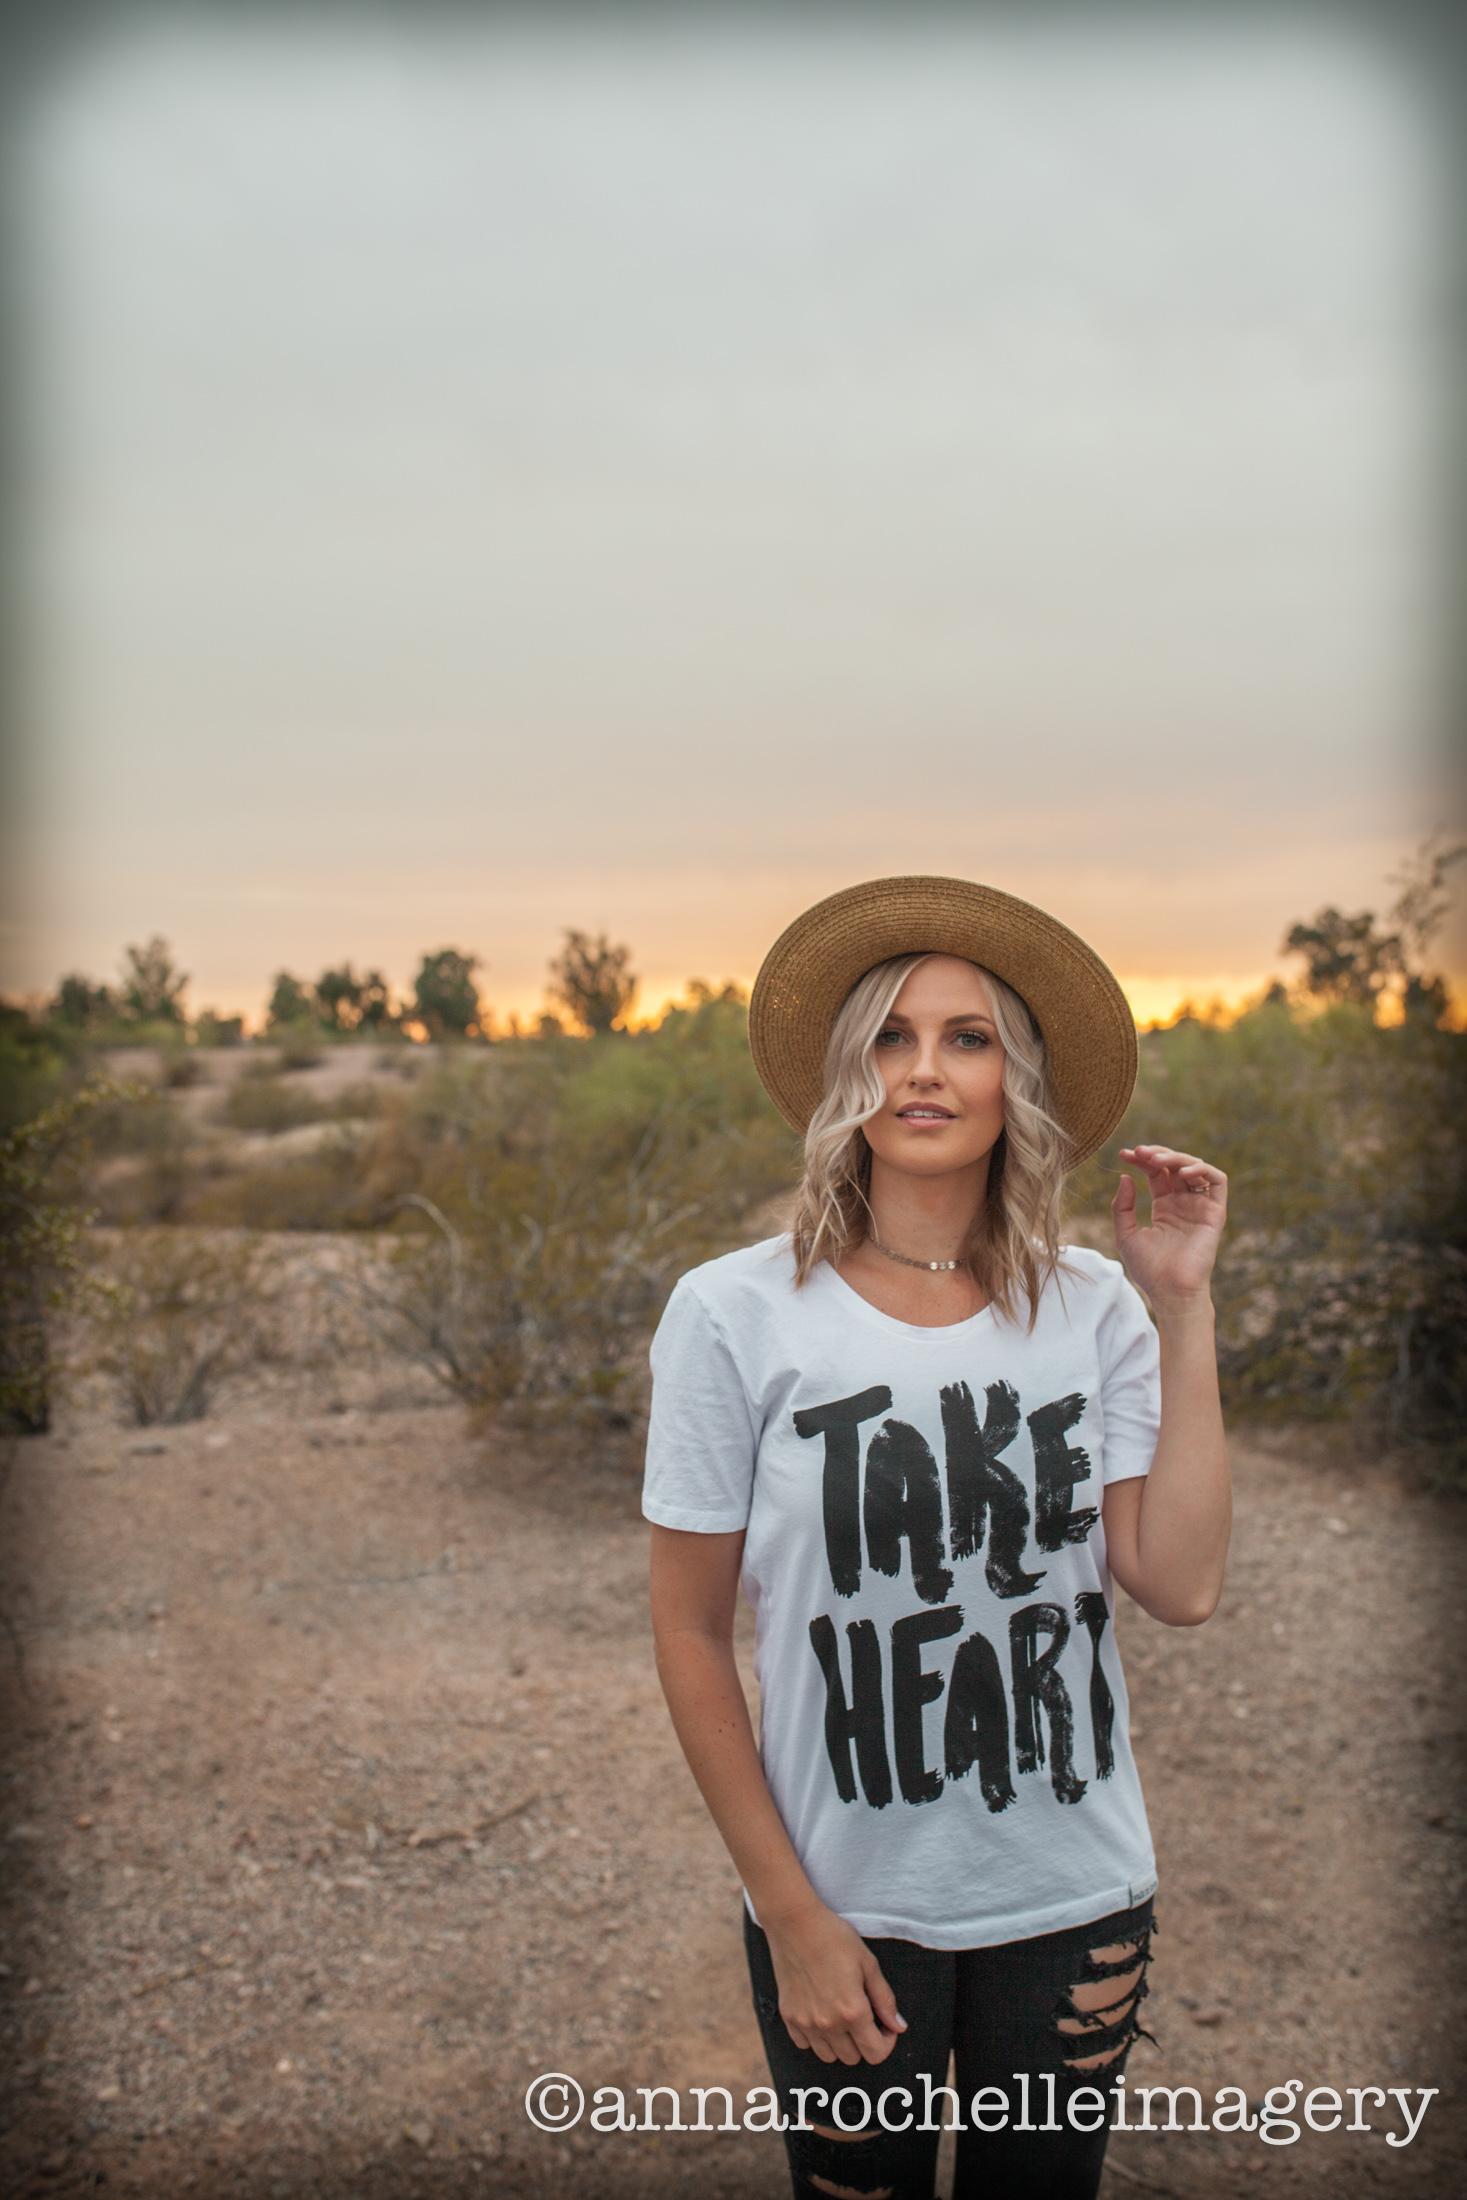 takeheart-2.jpg